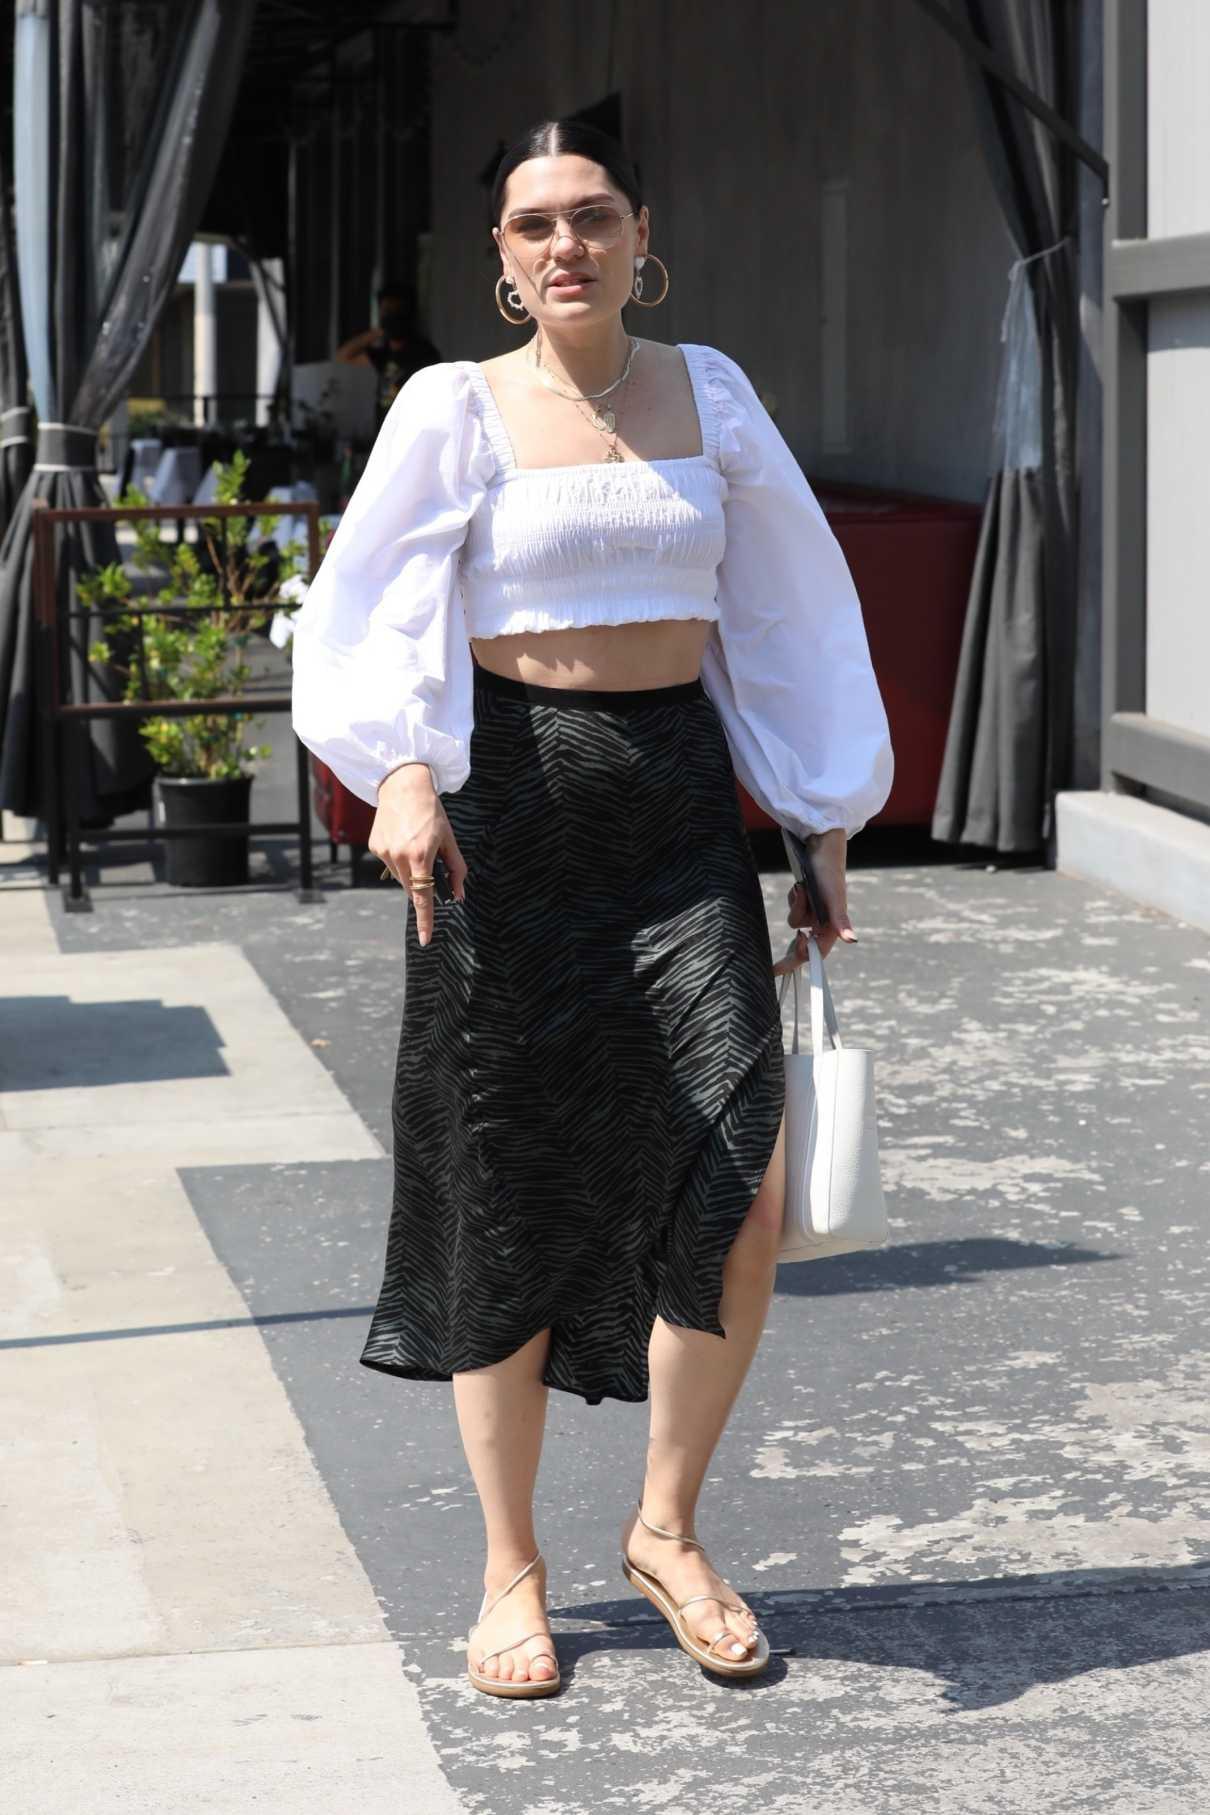 Jessie J in a White Blouse